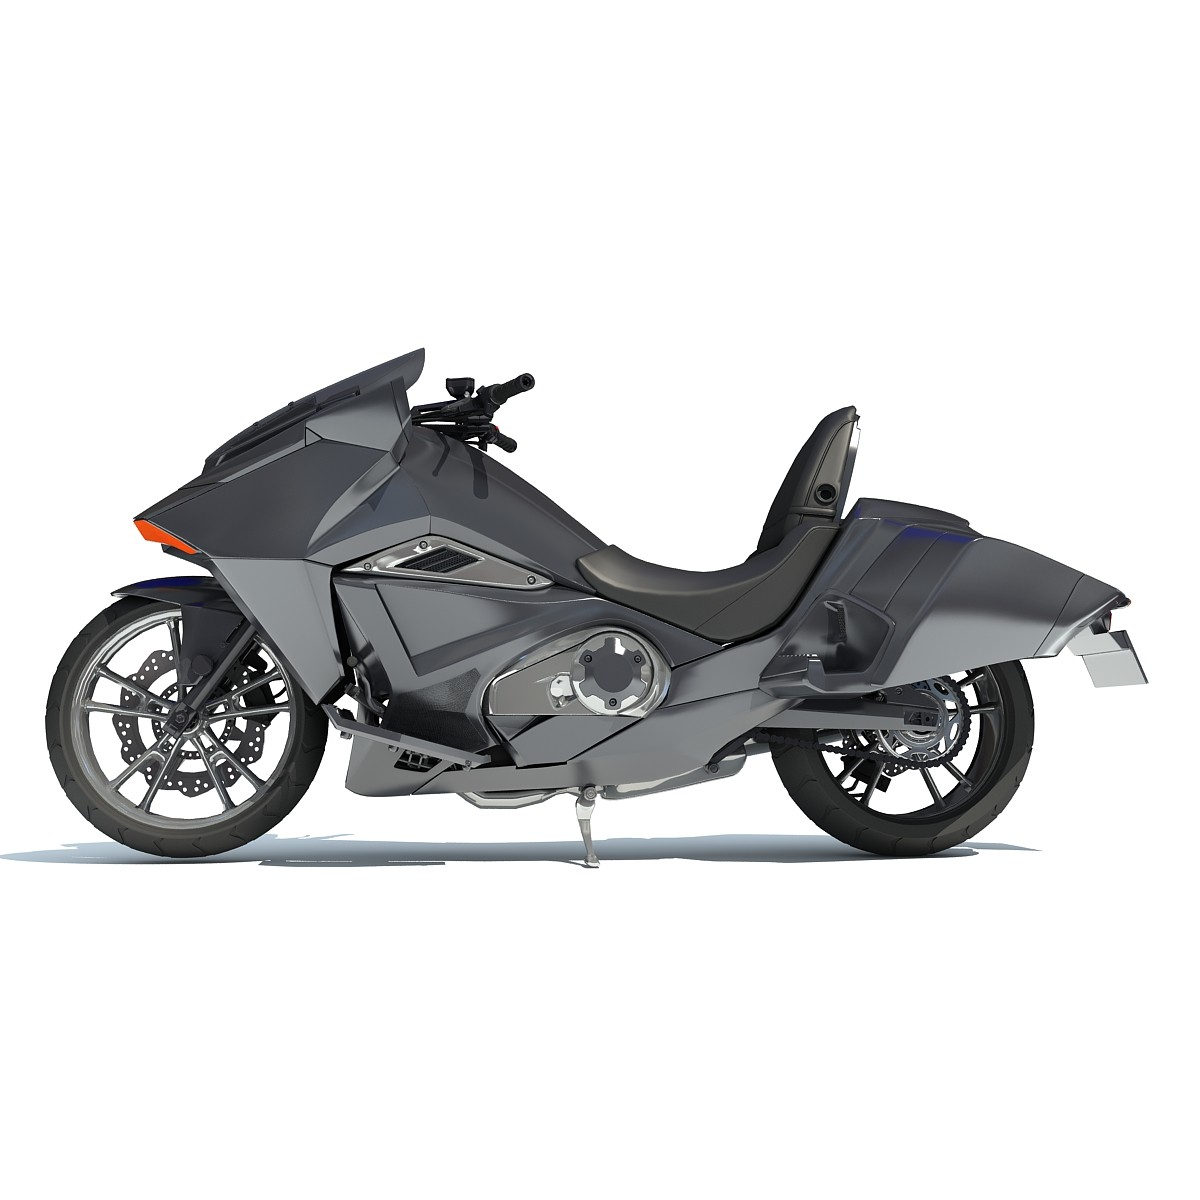 Honda-0001.jpg